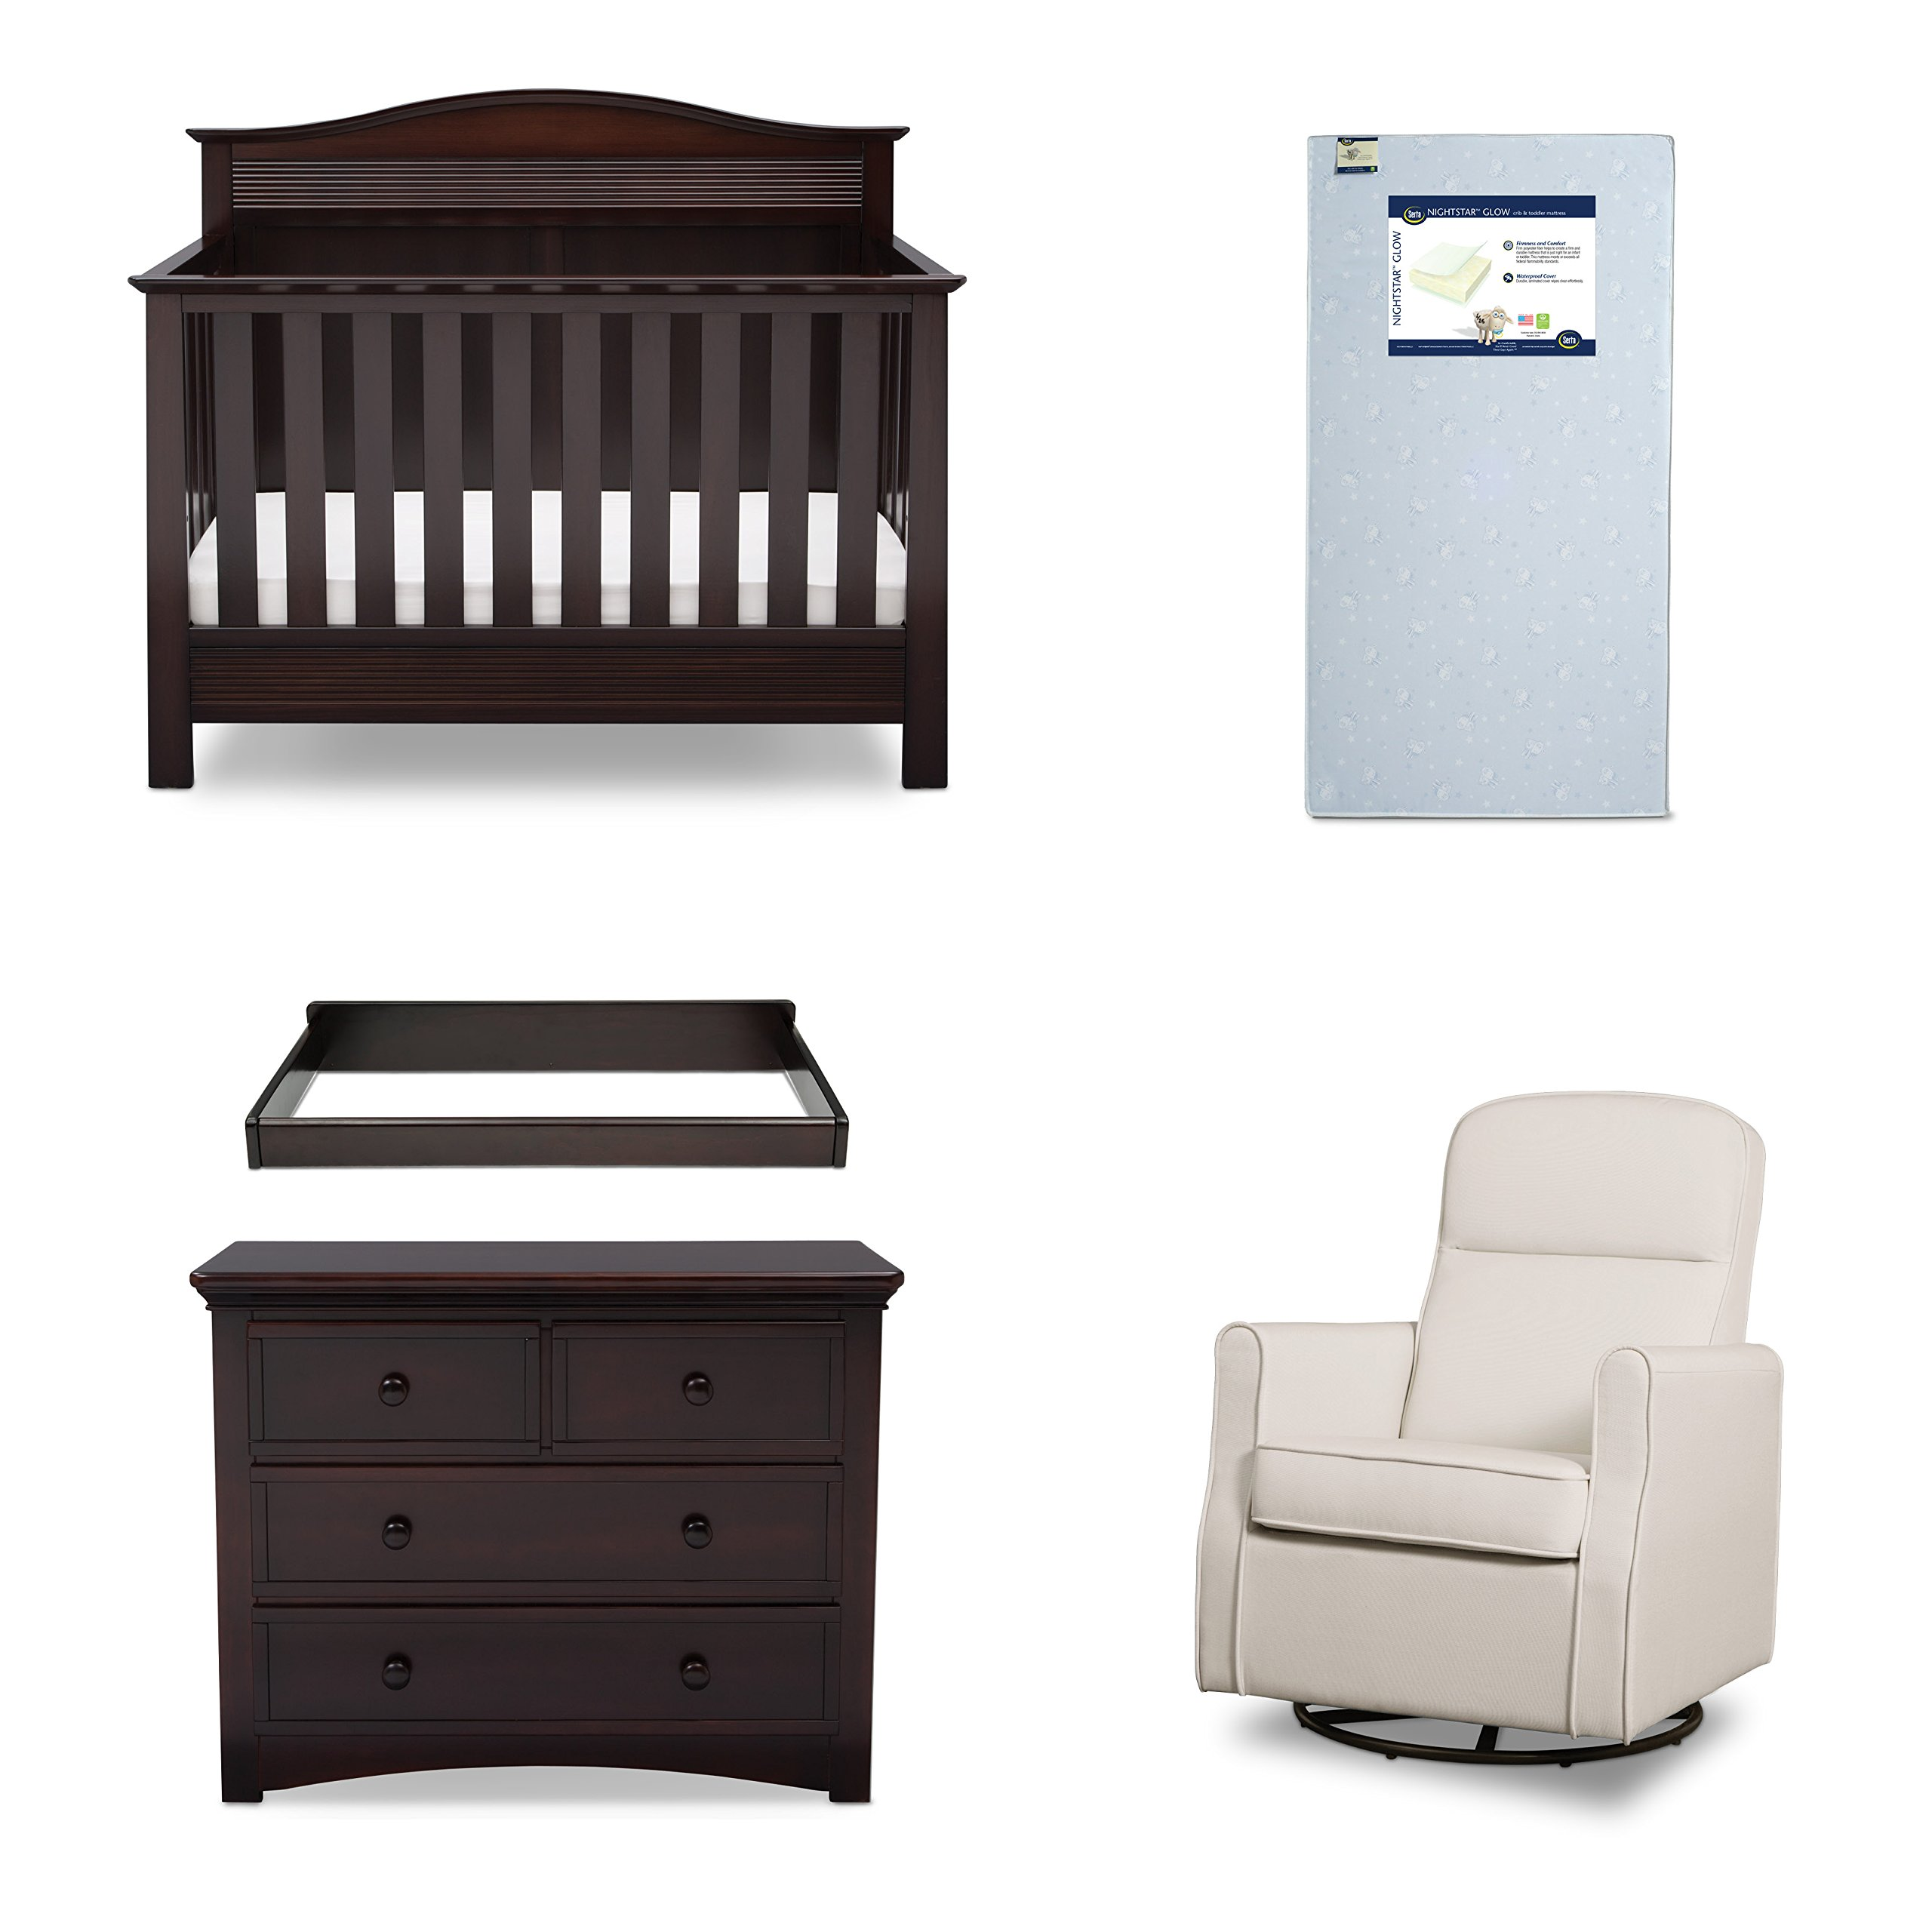 Serta Barrett 5-Piece Nursery Furniture Set (Serta Convertible Crib, 4-Drawer Dresser, Changing Top, Serta Crib Mattress, Glider), Dark Chocolate